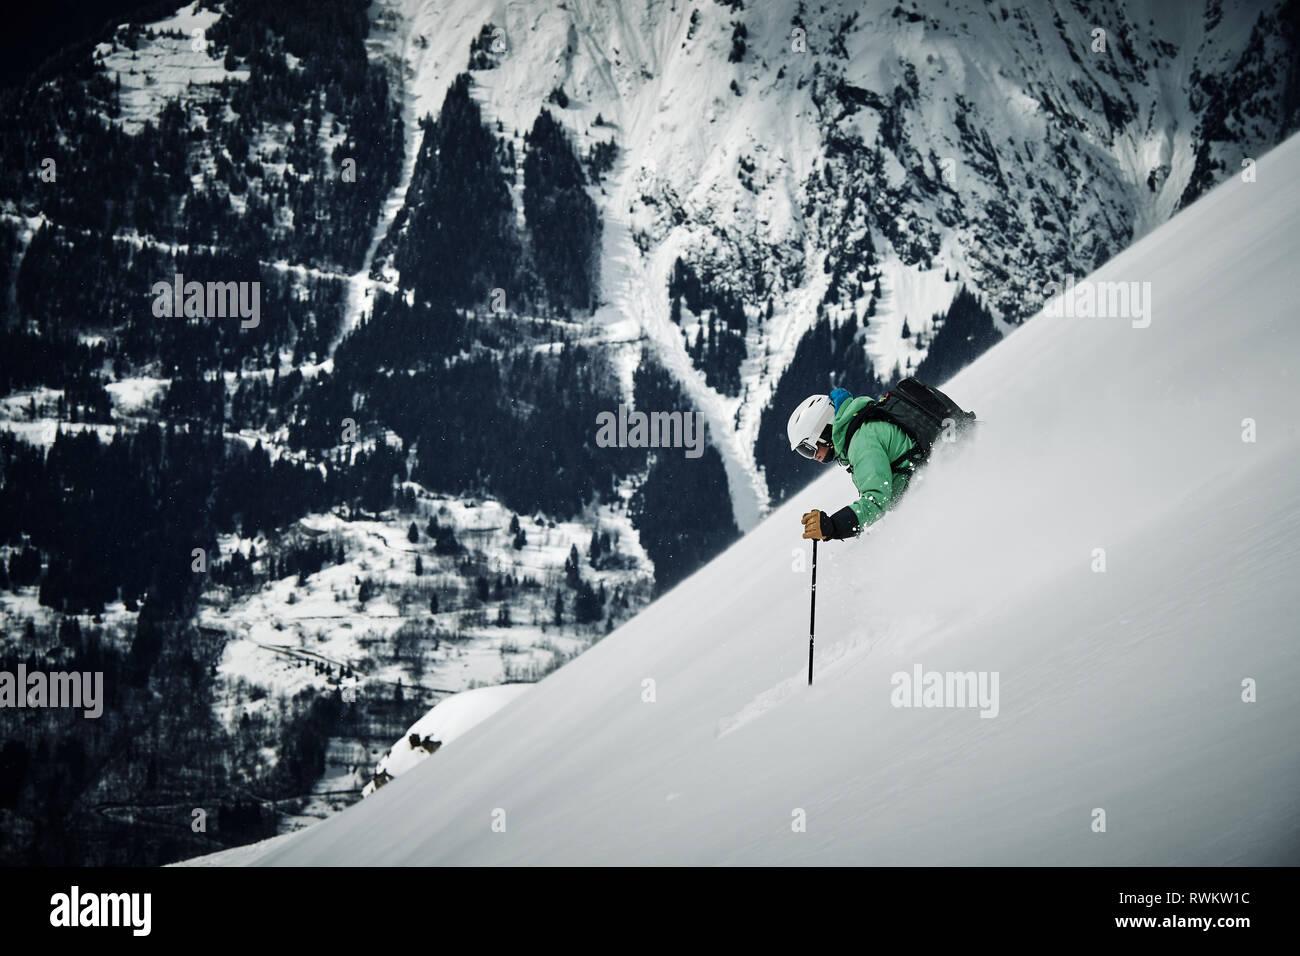 Male skier skiing down steep mountainside, Alpe-d'Huez, Rhone-Alpes, France - Stock Image